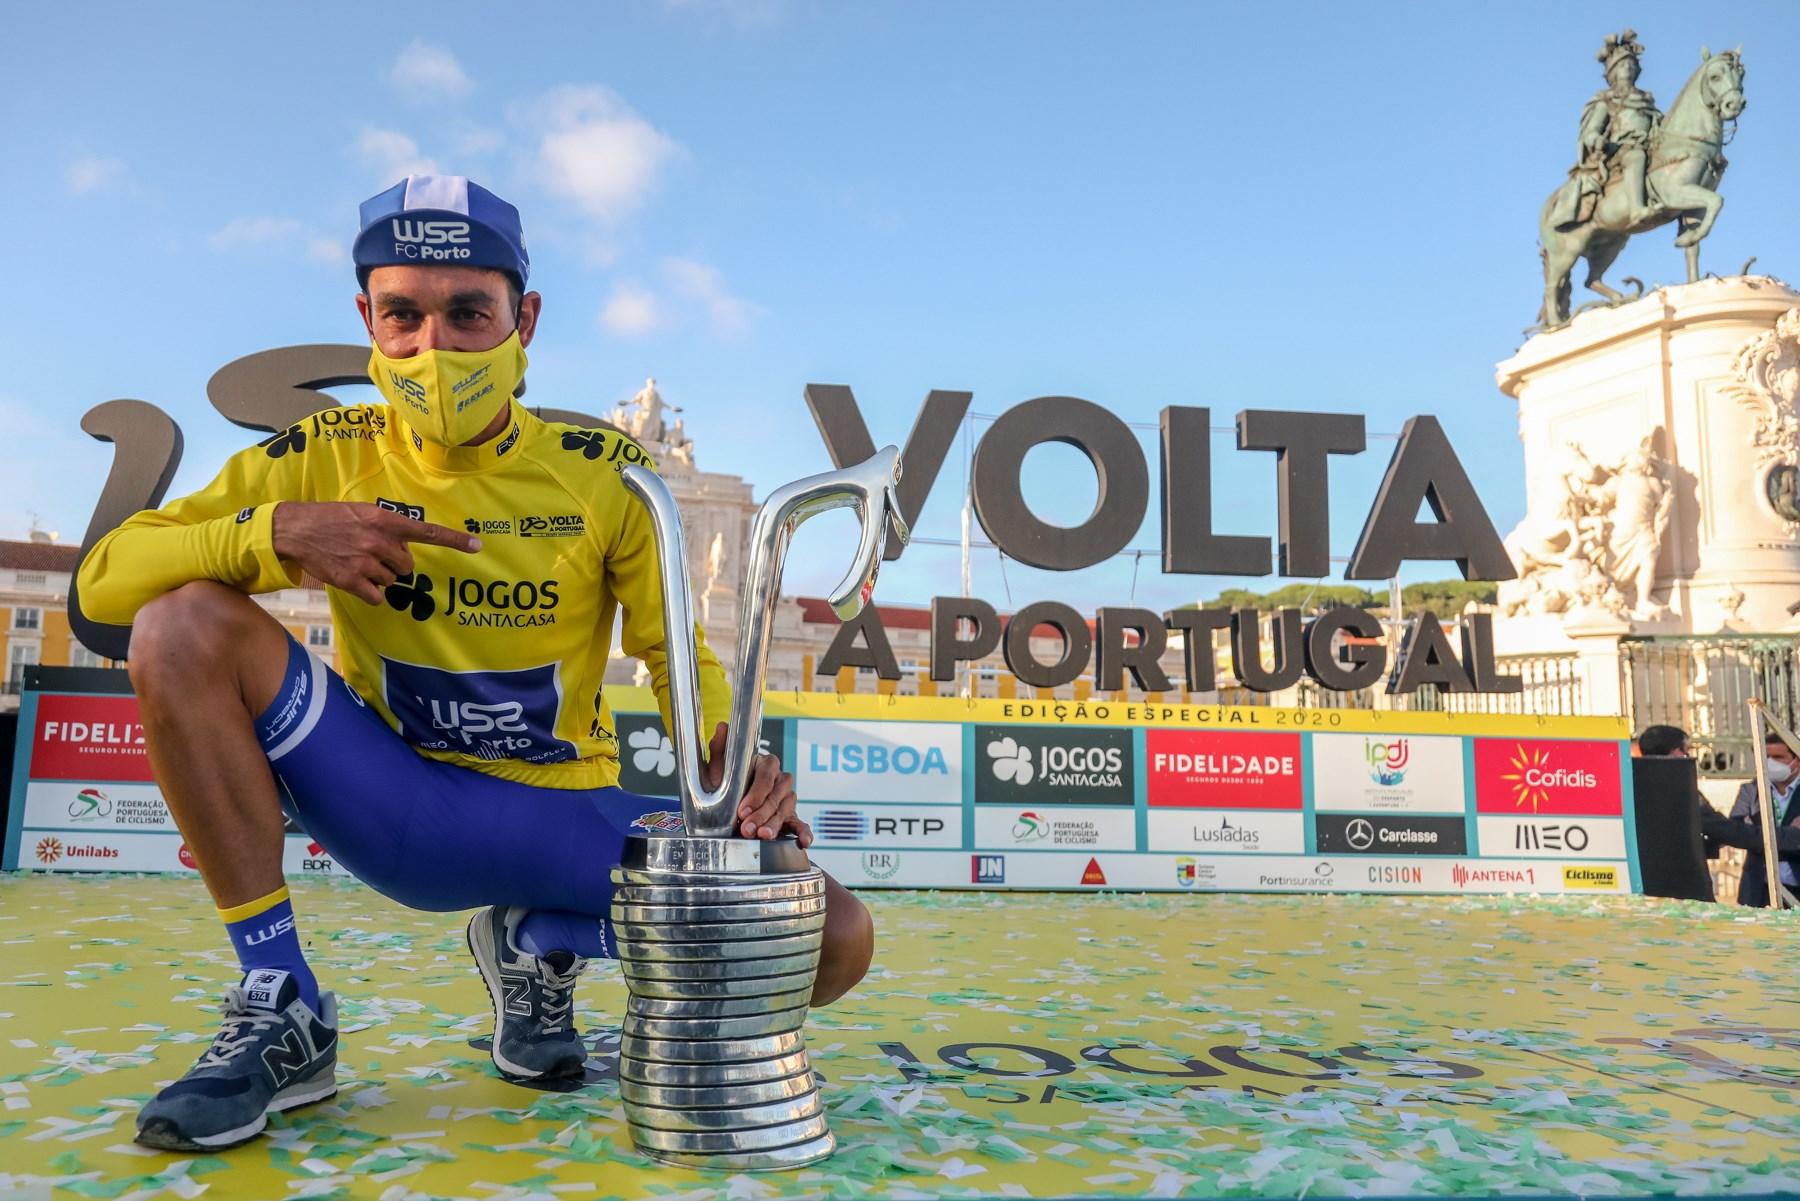 Veloso vence contrarrelógio final, na Volta de Amaro Antunes!